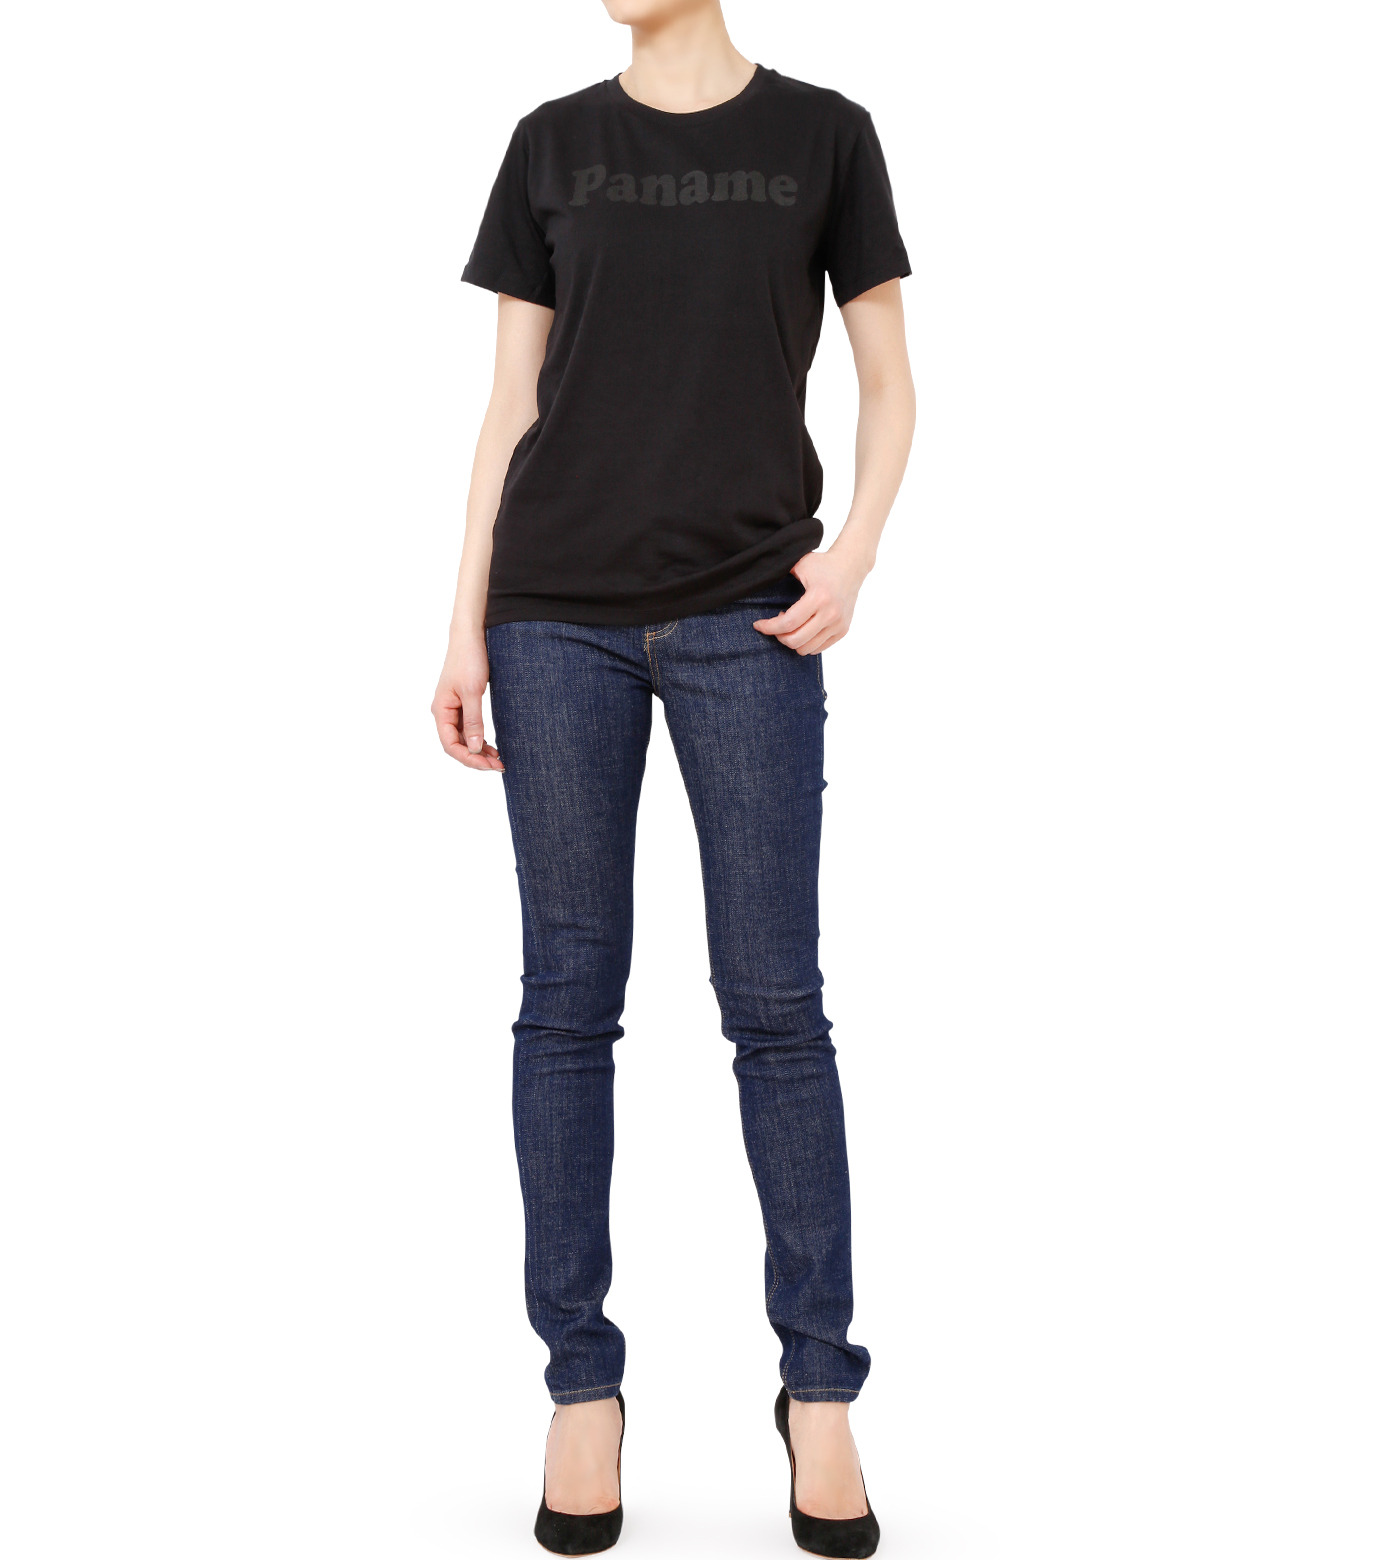 No One(ノーワン)のPanama T-shirt-BLACK(カットソー/cut and sewn)-BA545-13 拡大詳細画像3